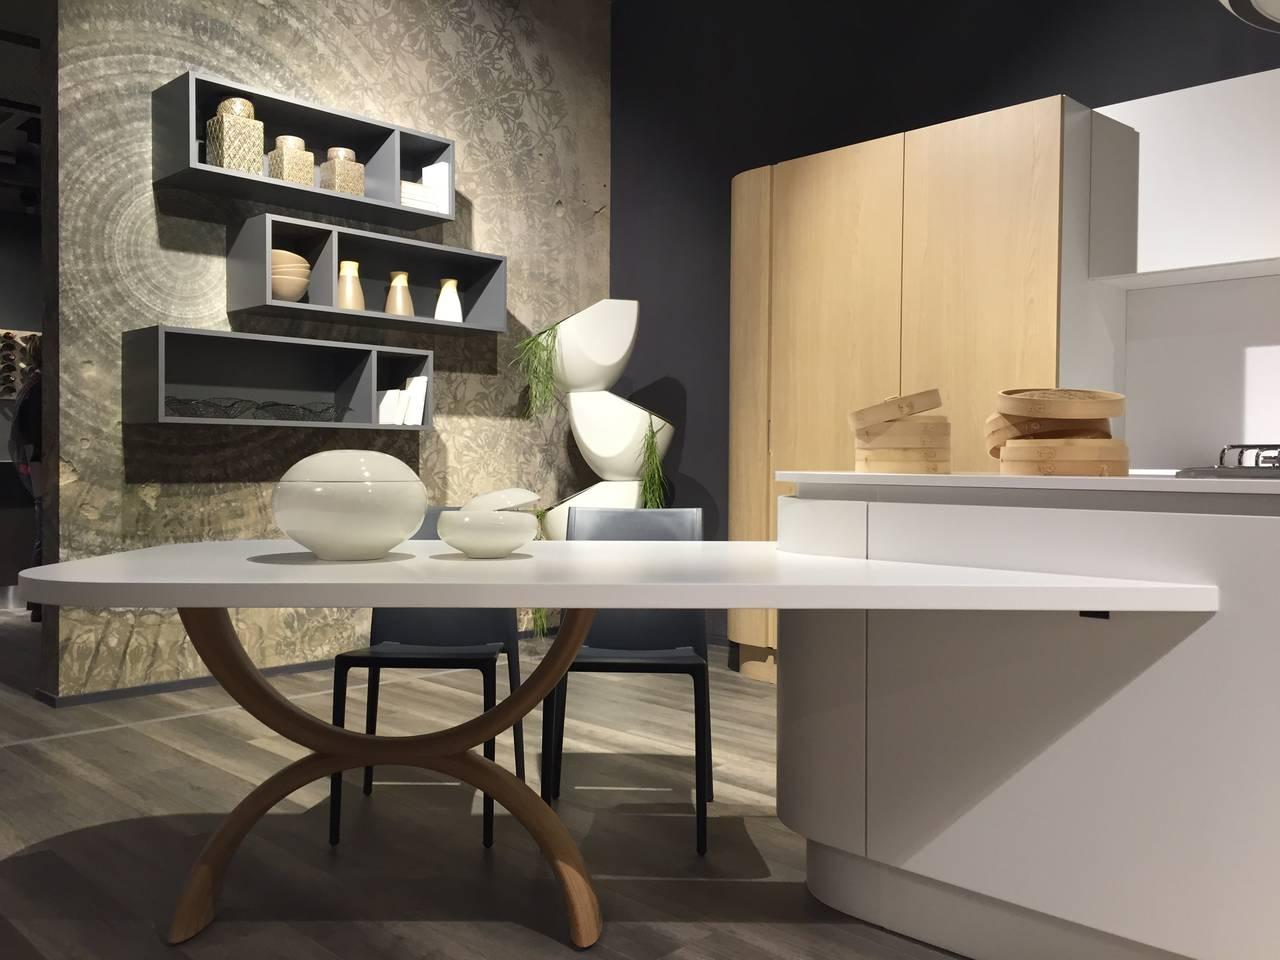 Berloni, nuove idee per la cucina | Ambiente Cucina